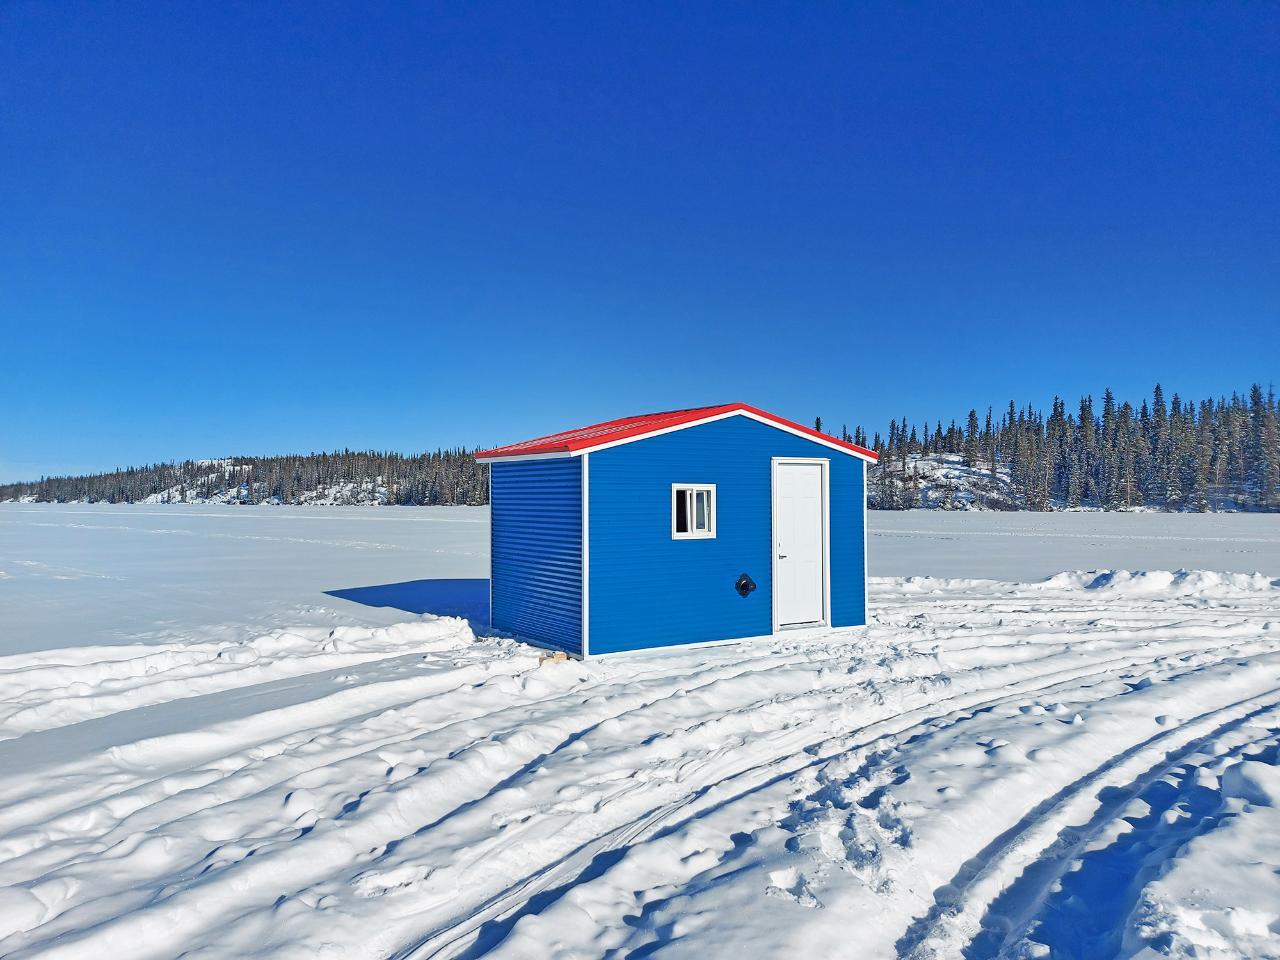 Staycation Yellowknife Ice Fishing Shacks Rentals